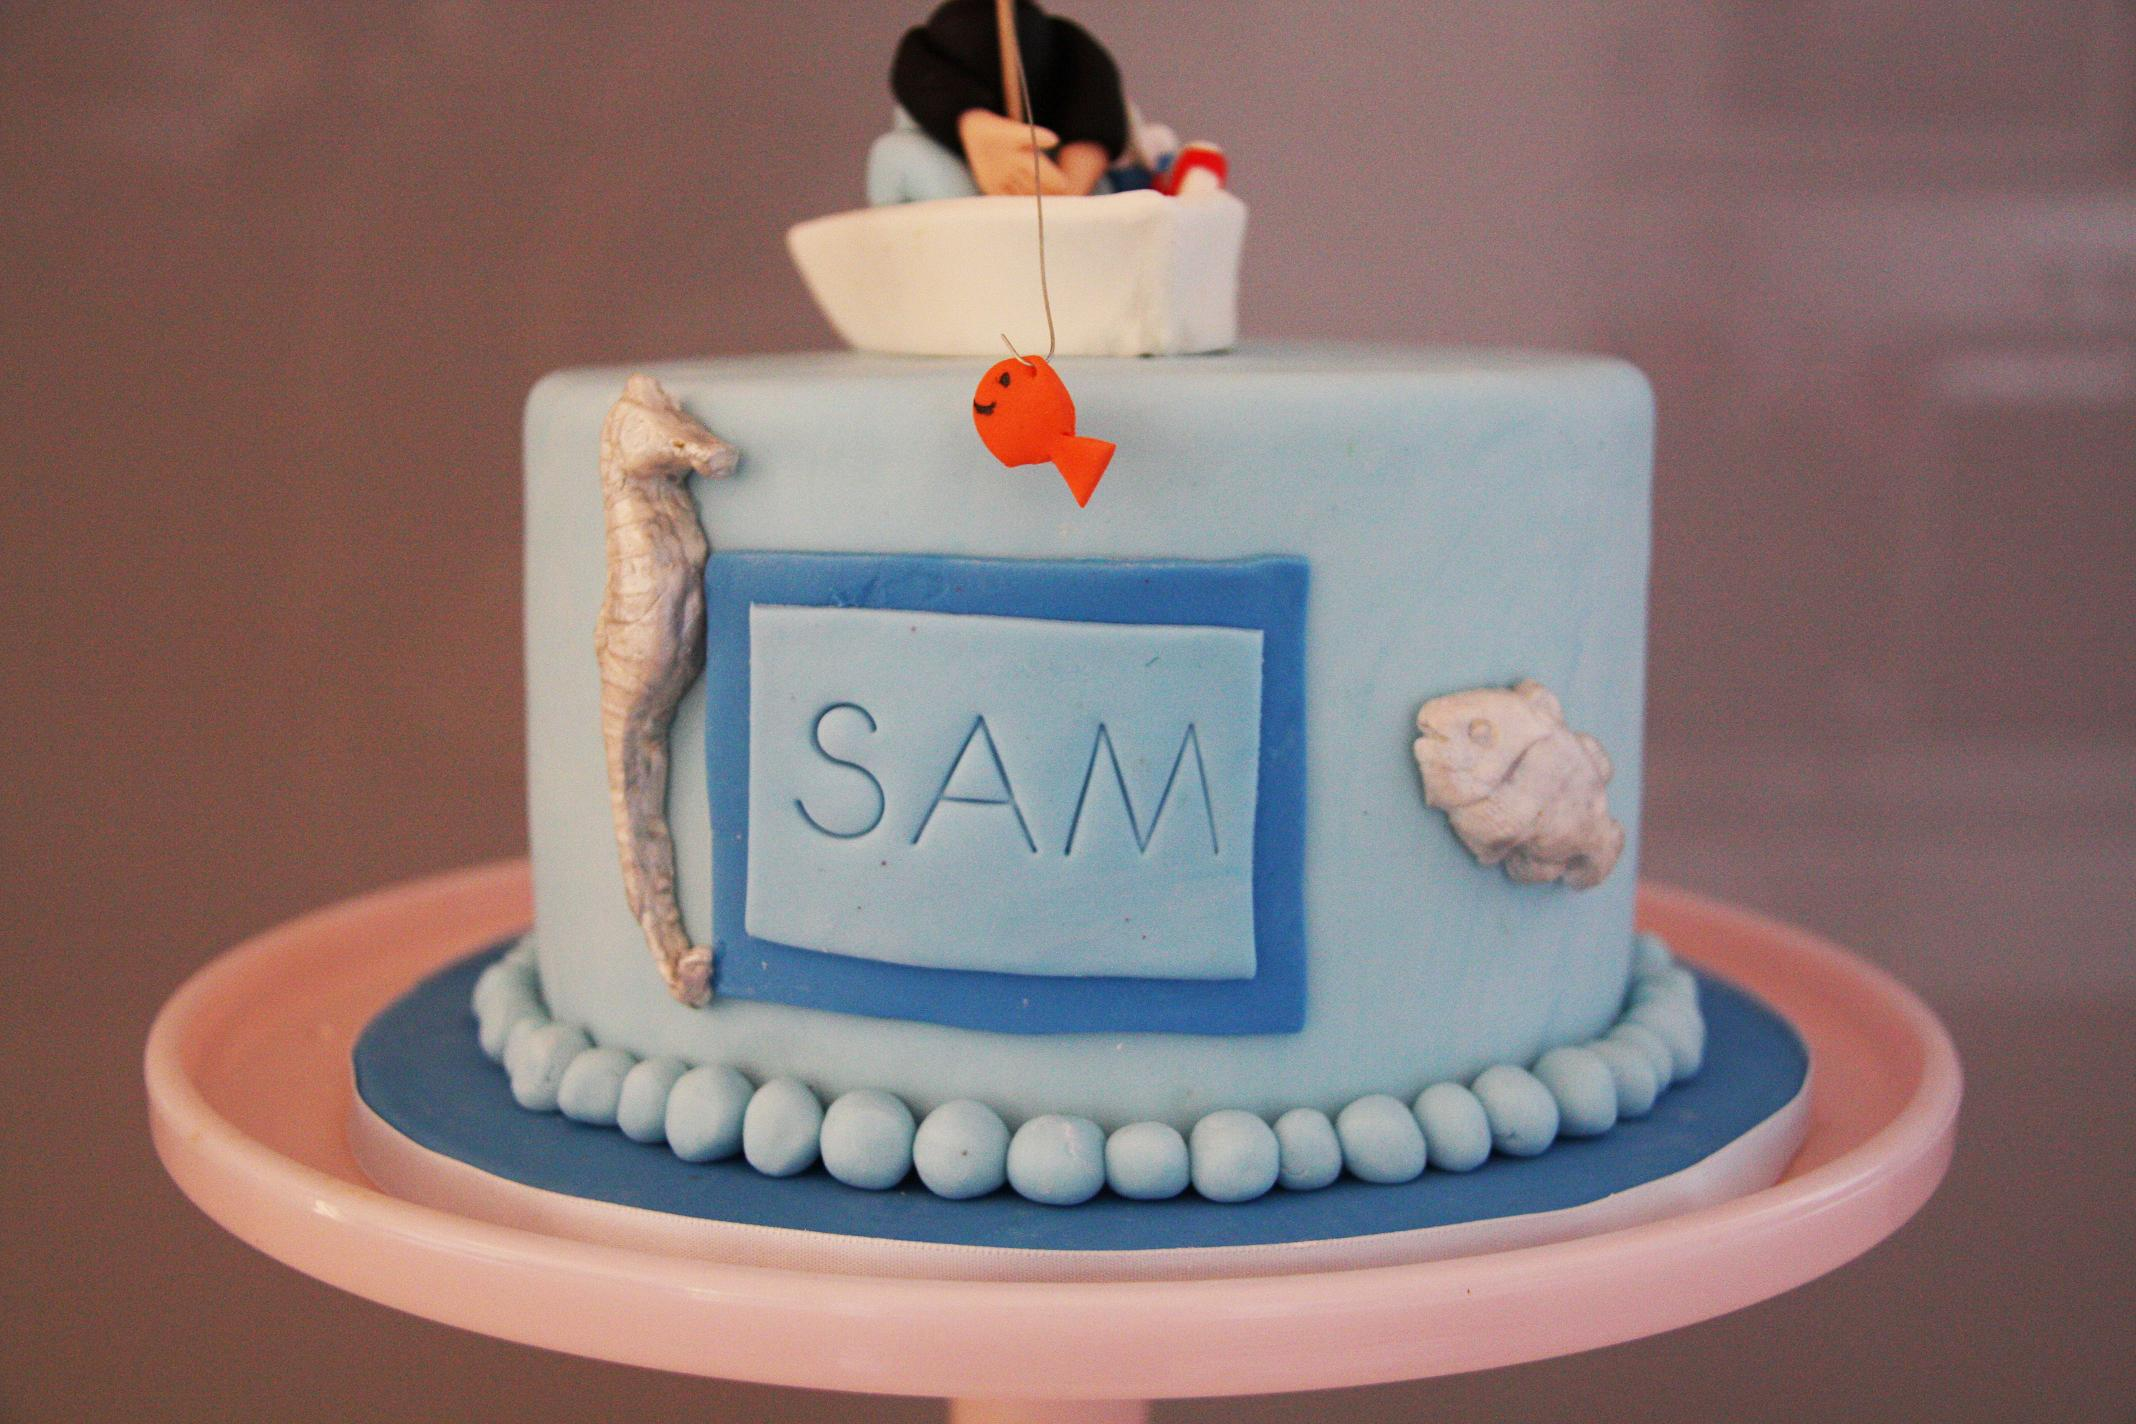 Peachy 10 Sams Birthday Cakes For Girls Photo Birthday Cakes From Funny Birthday Cards Online Alyptdamsfinfo